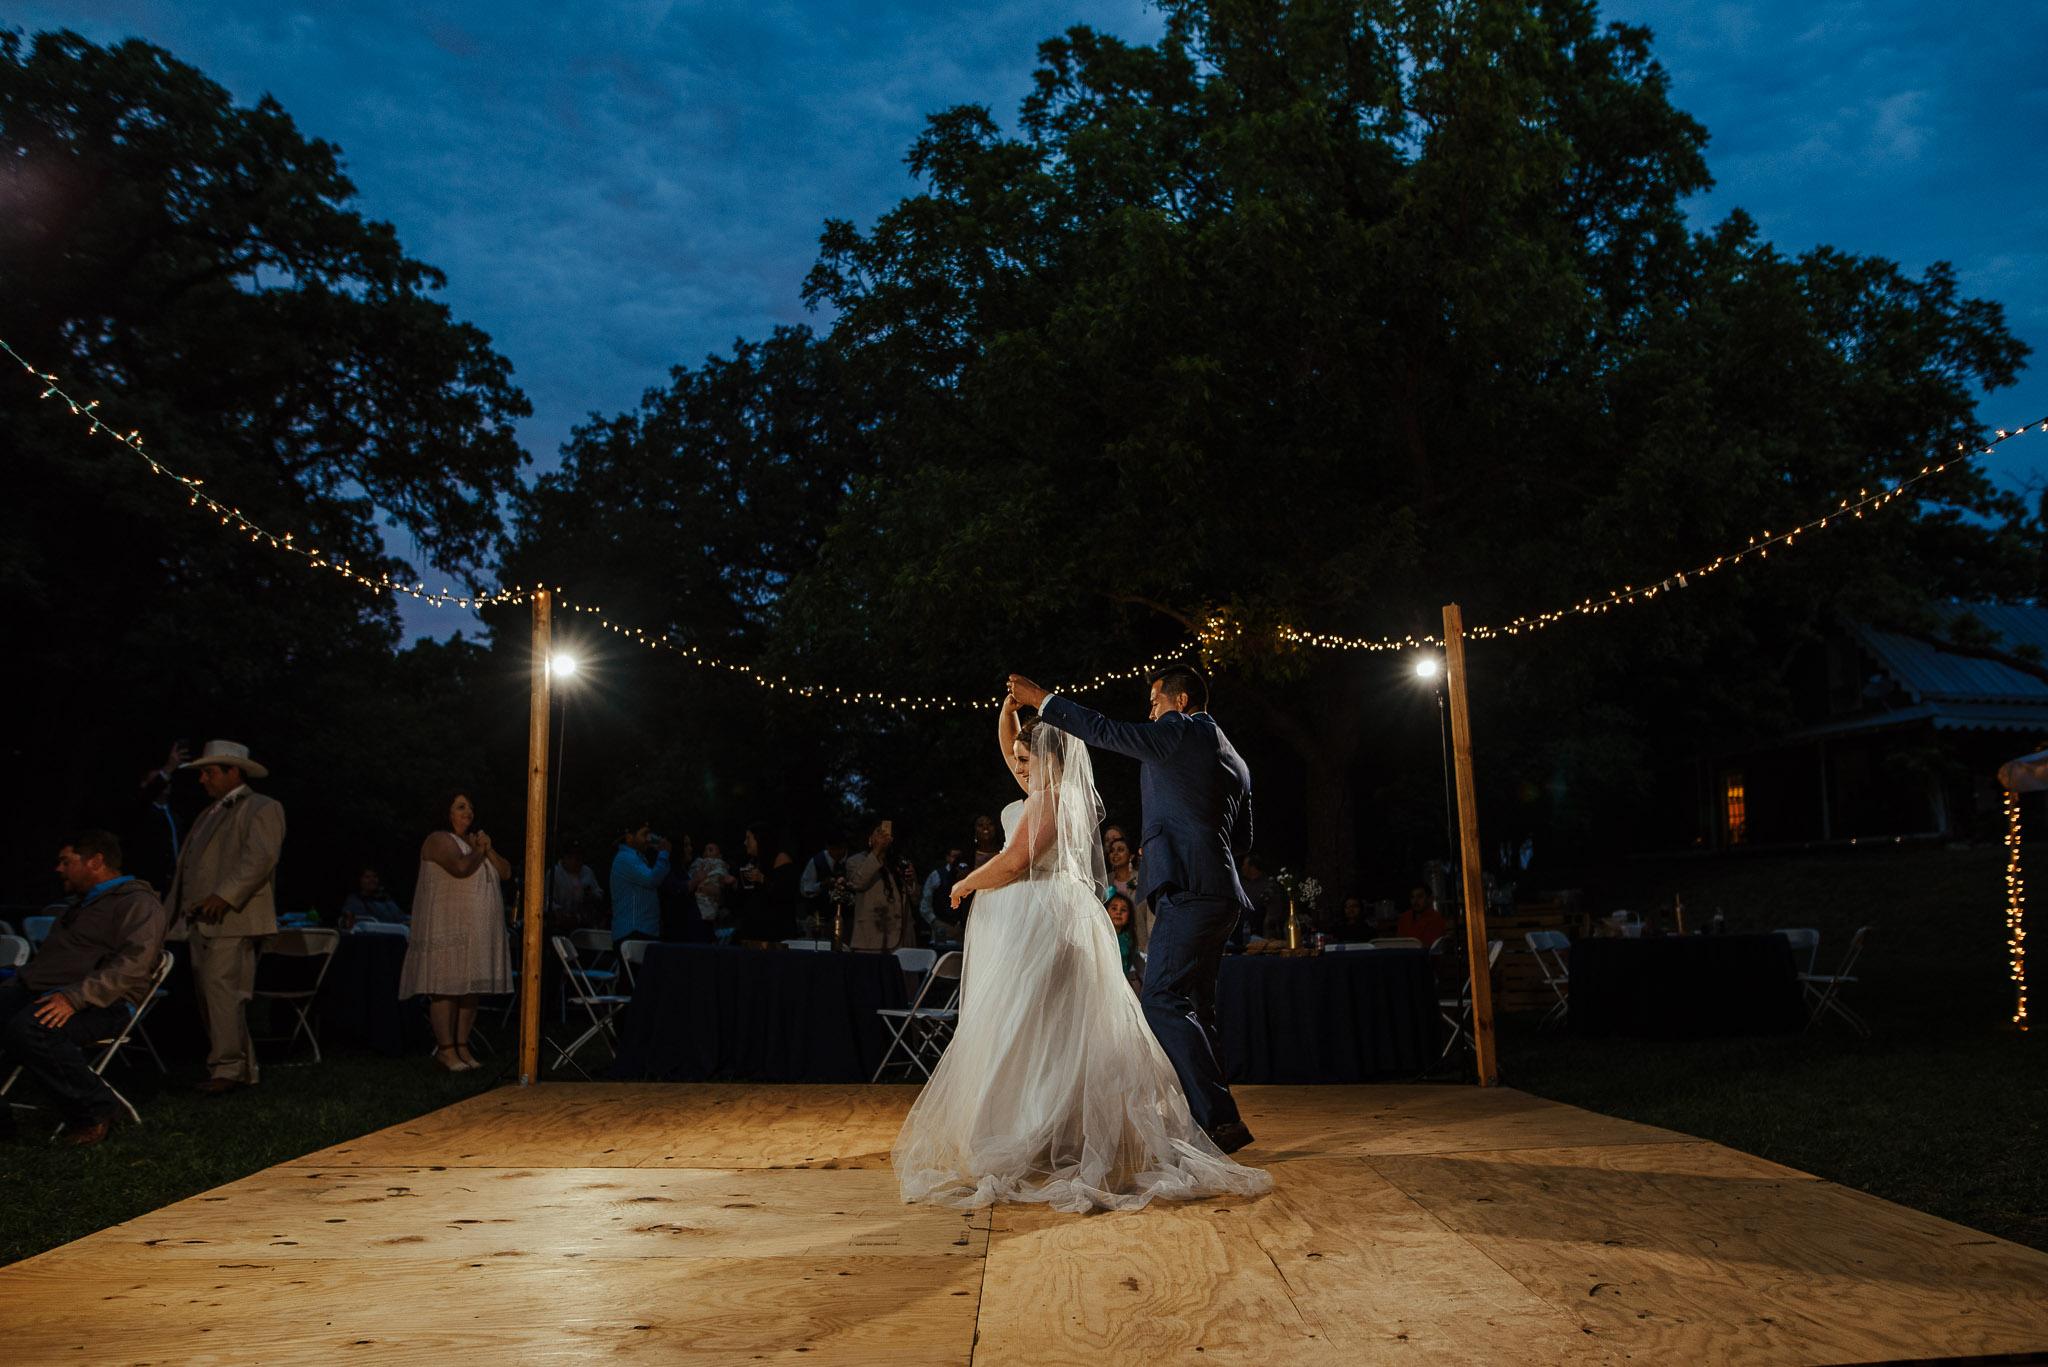 Christoval-Texas-Wedding_Photographer-Meghan&Tony-0033.jpg